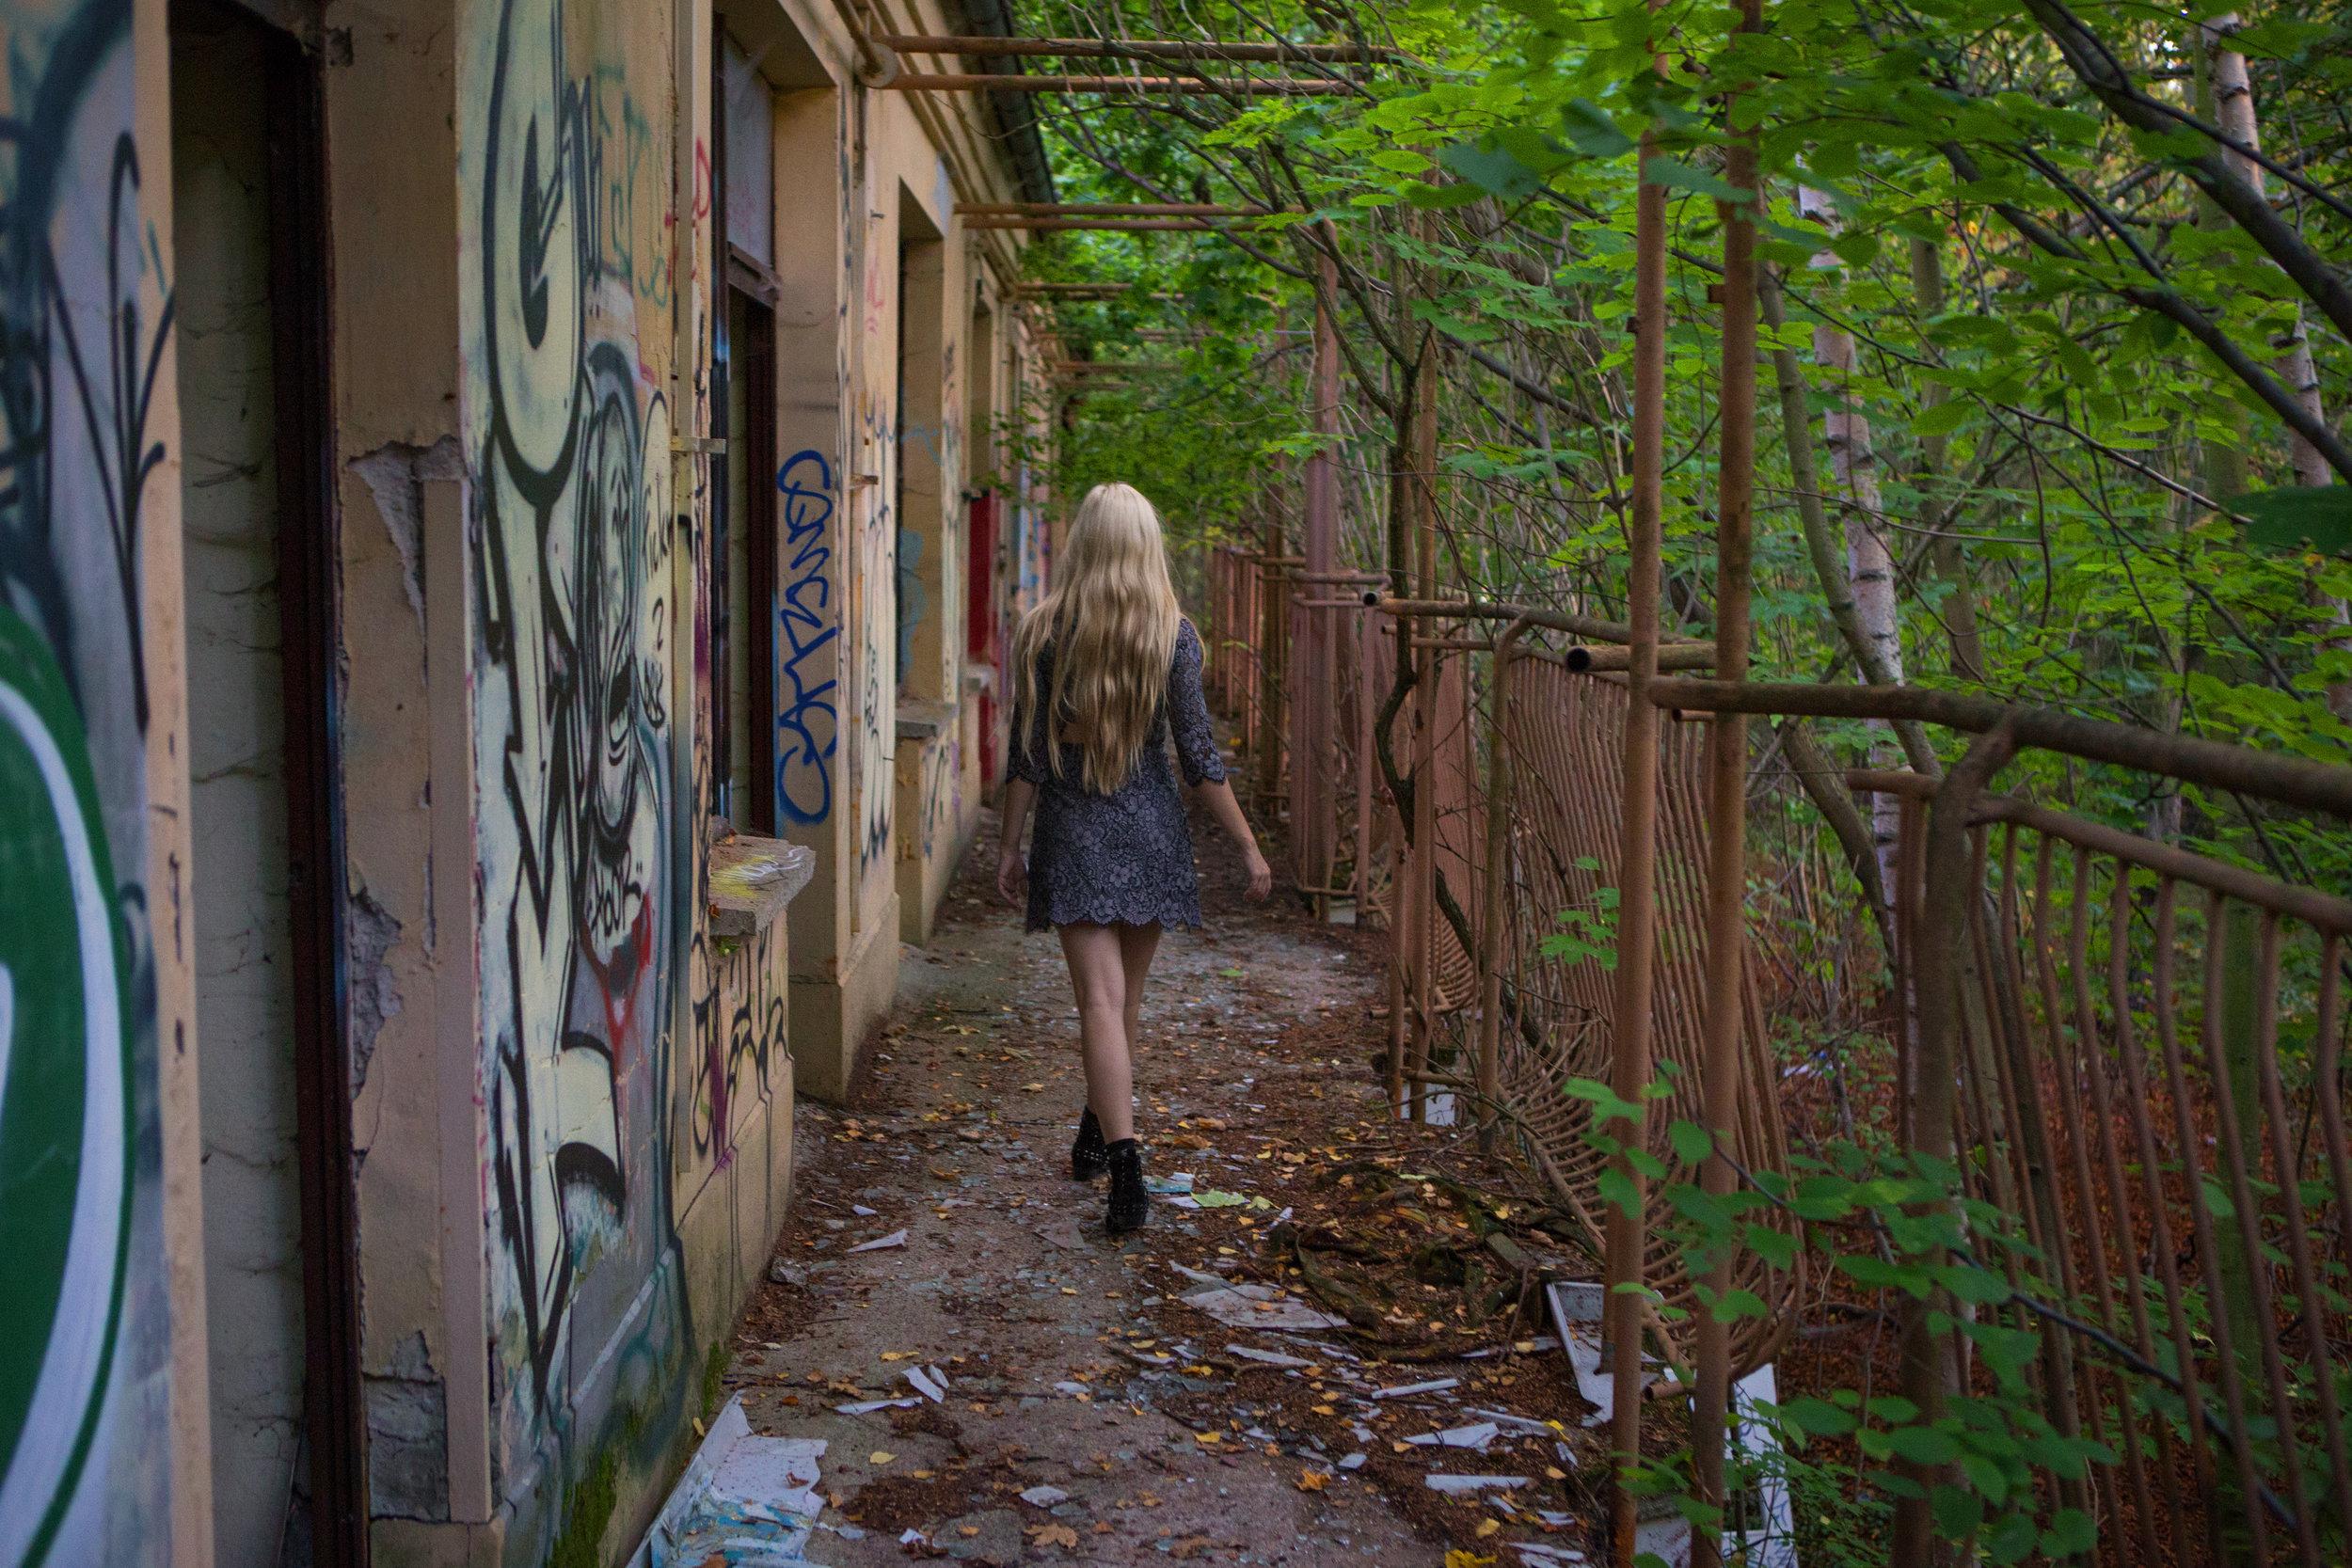 AstroBandit_Berlin_Abandoned_Childrens_Hospital_Zombie_Weissensee_ForLoveandLemons_7.jpg